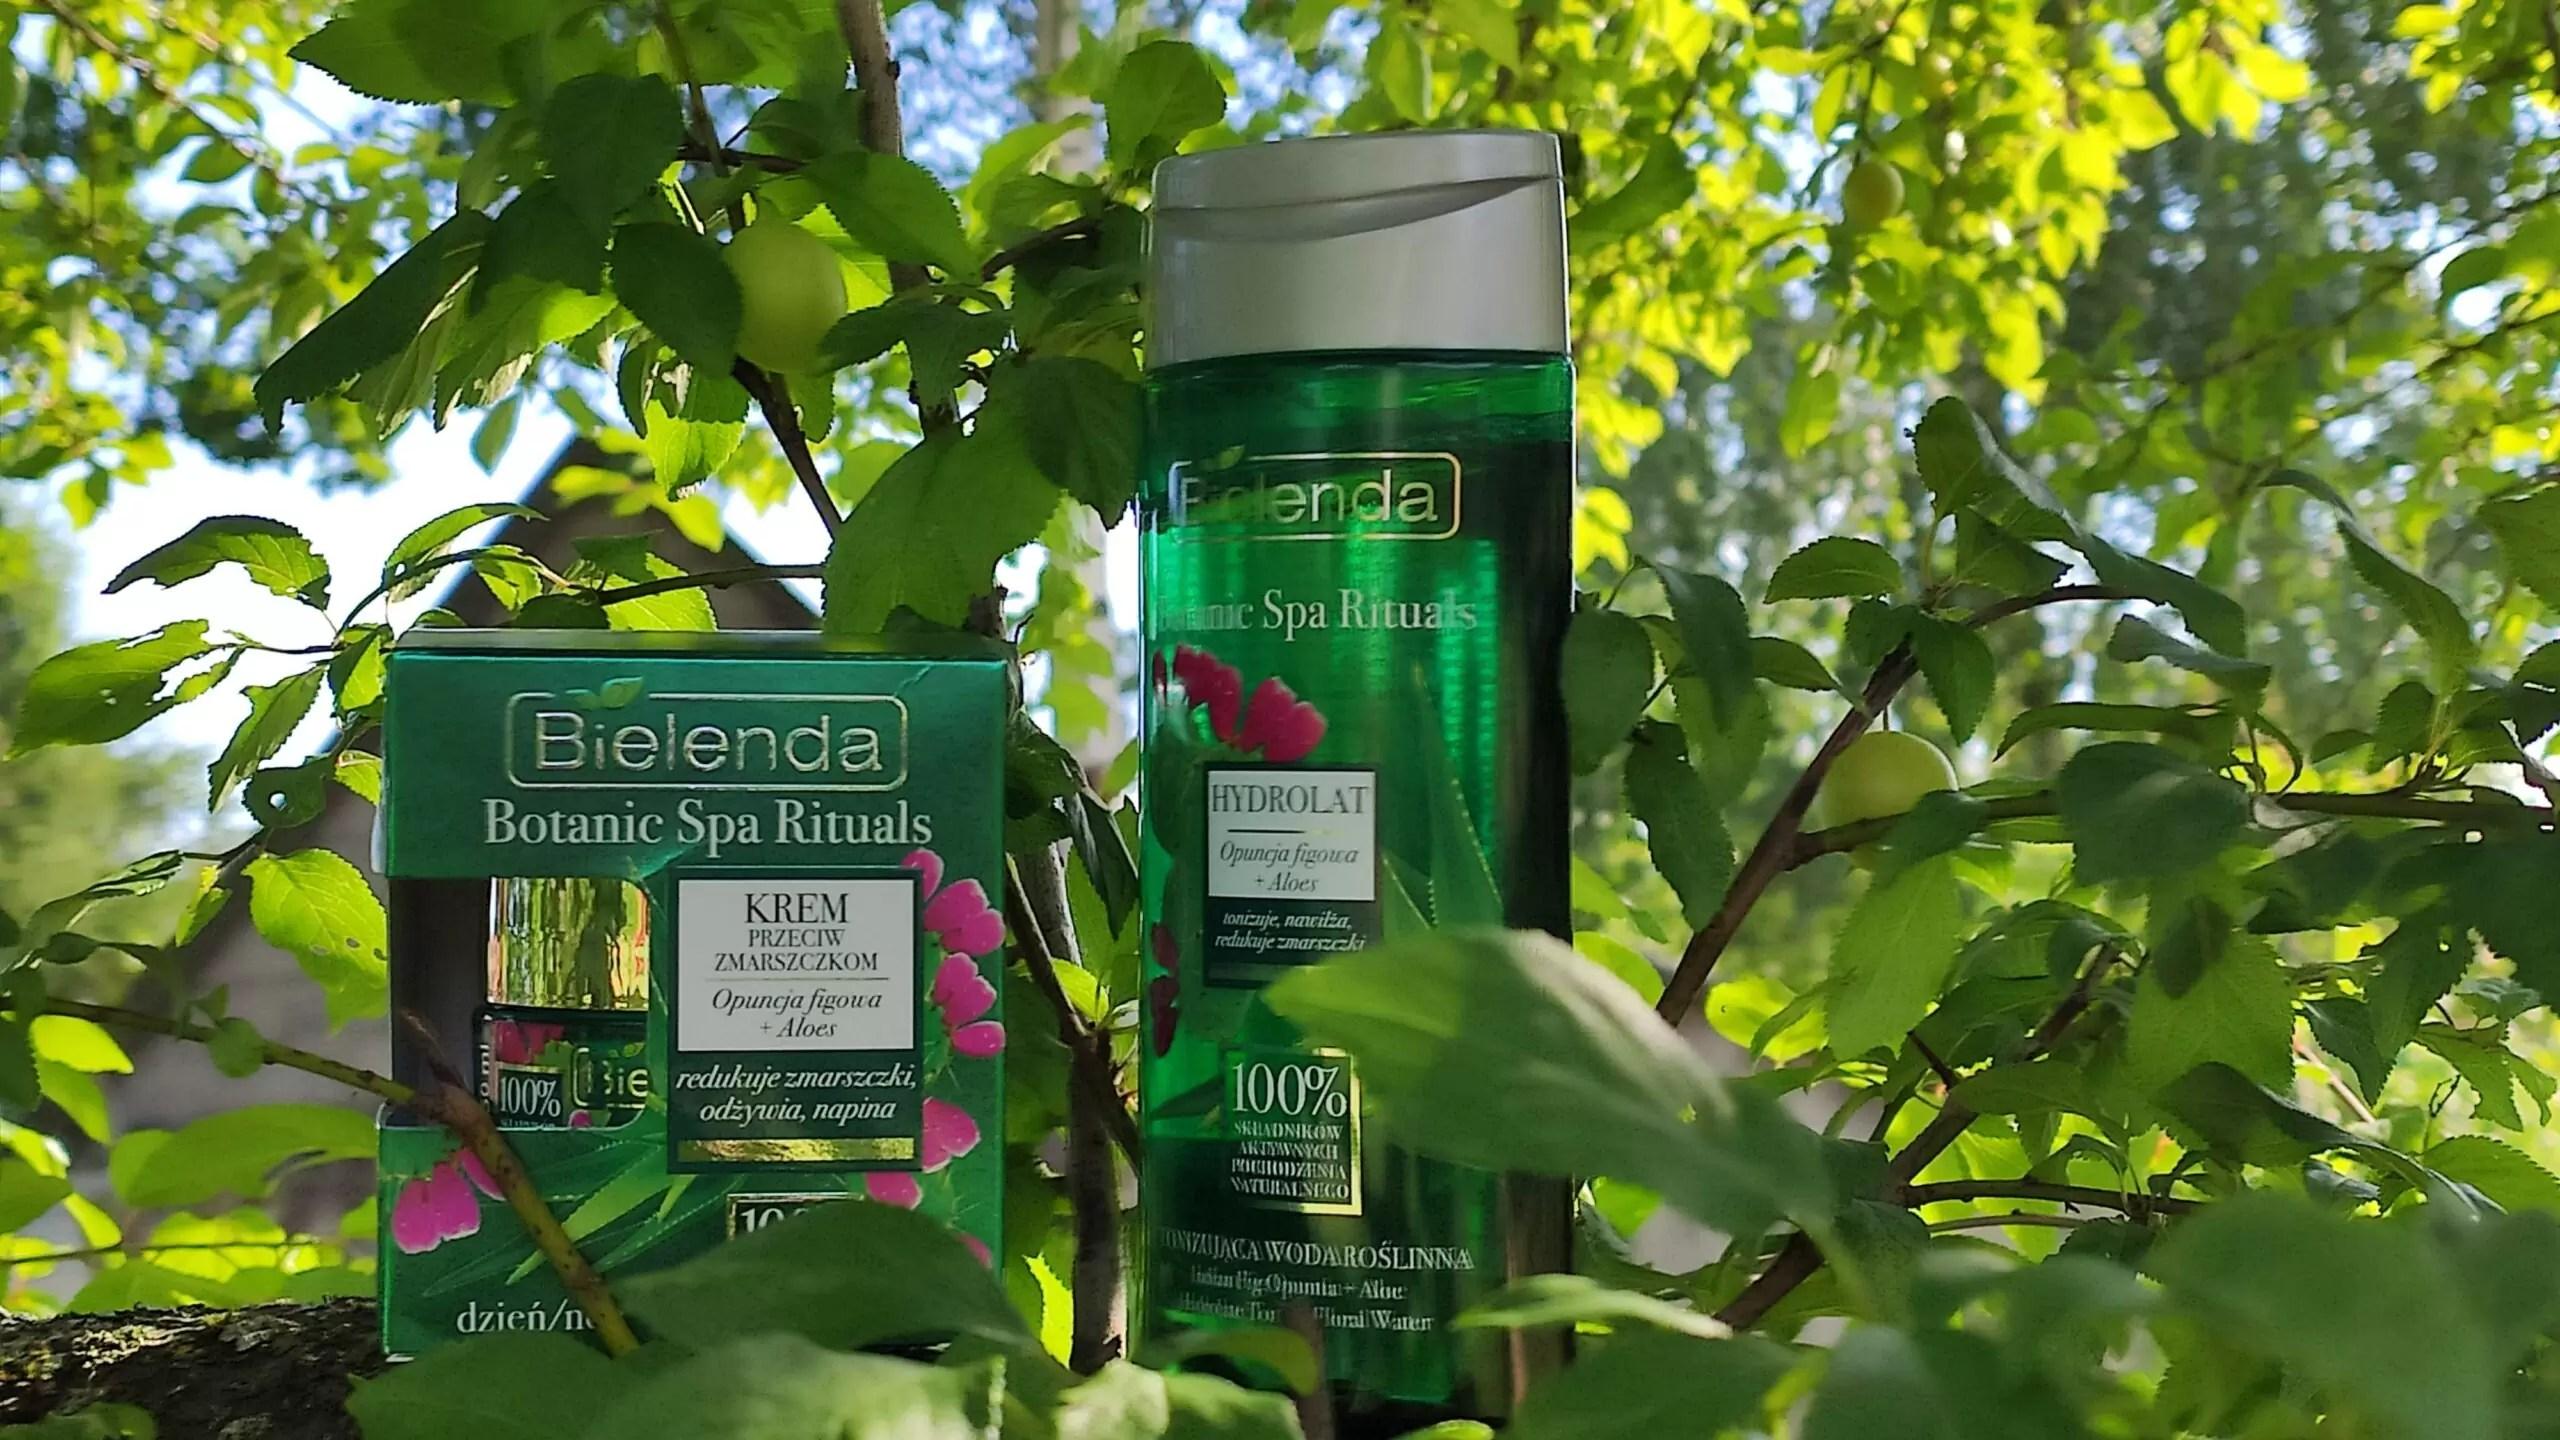 Bielenda Botanic Spa Rituals opuncja figowa i aloes